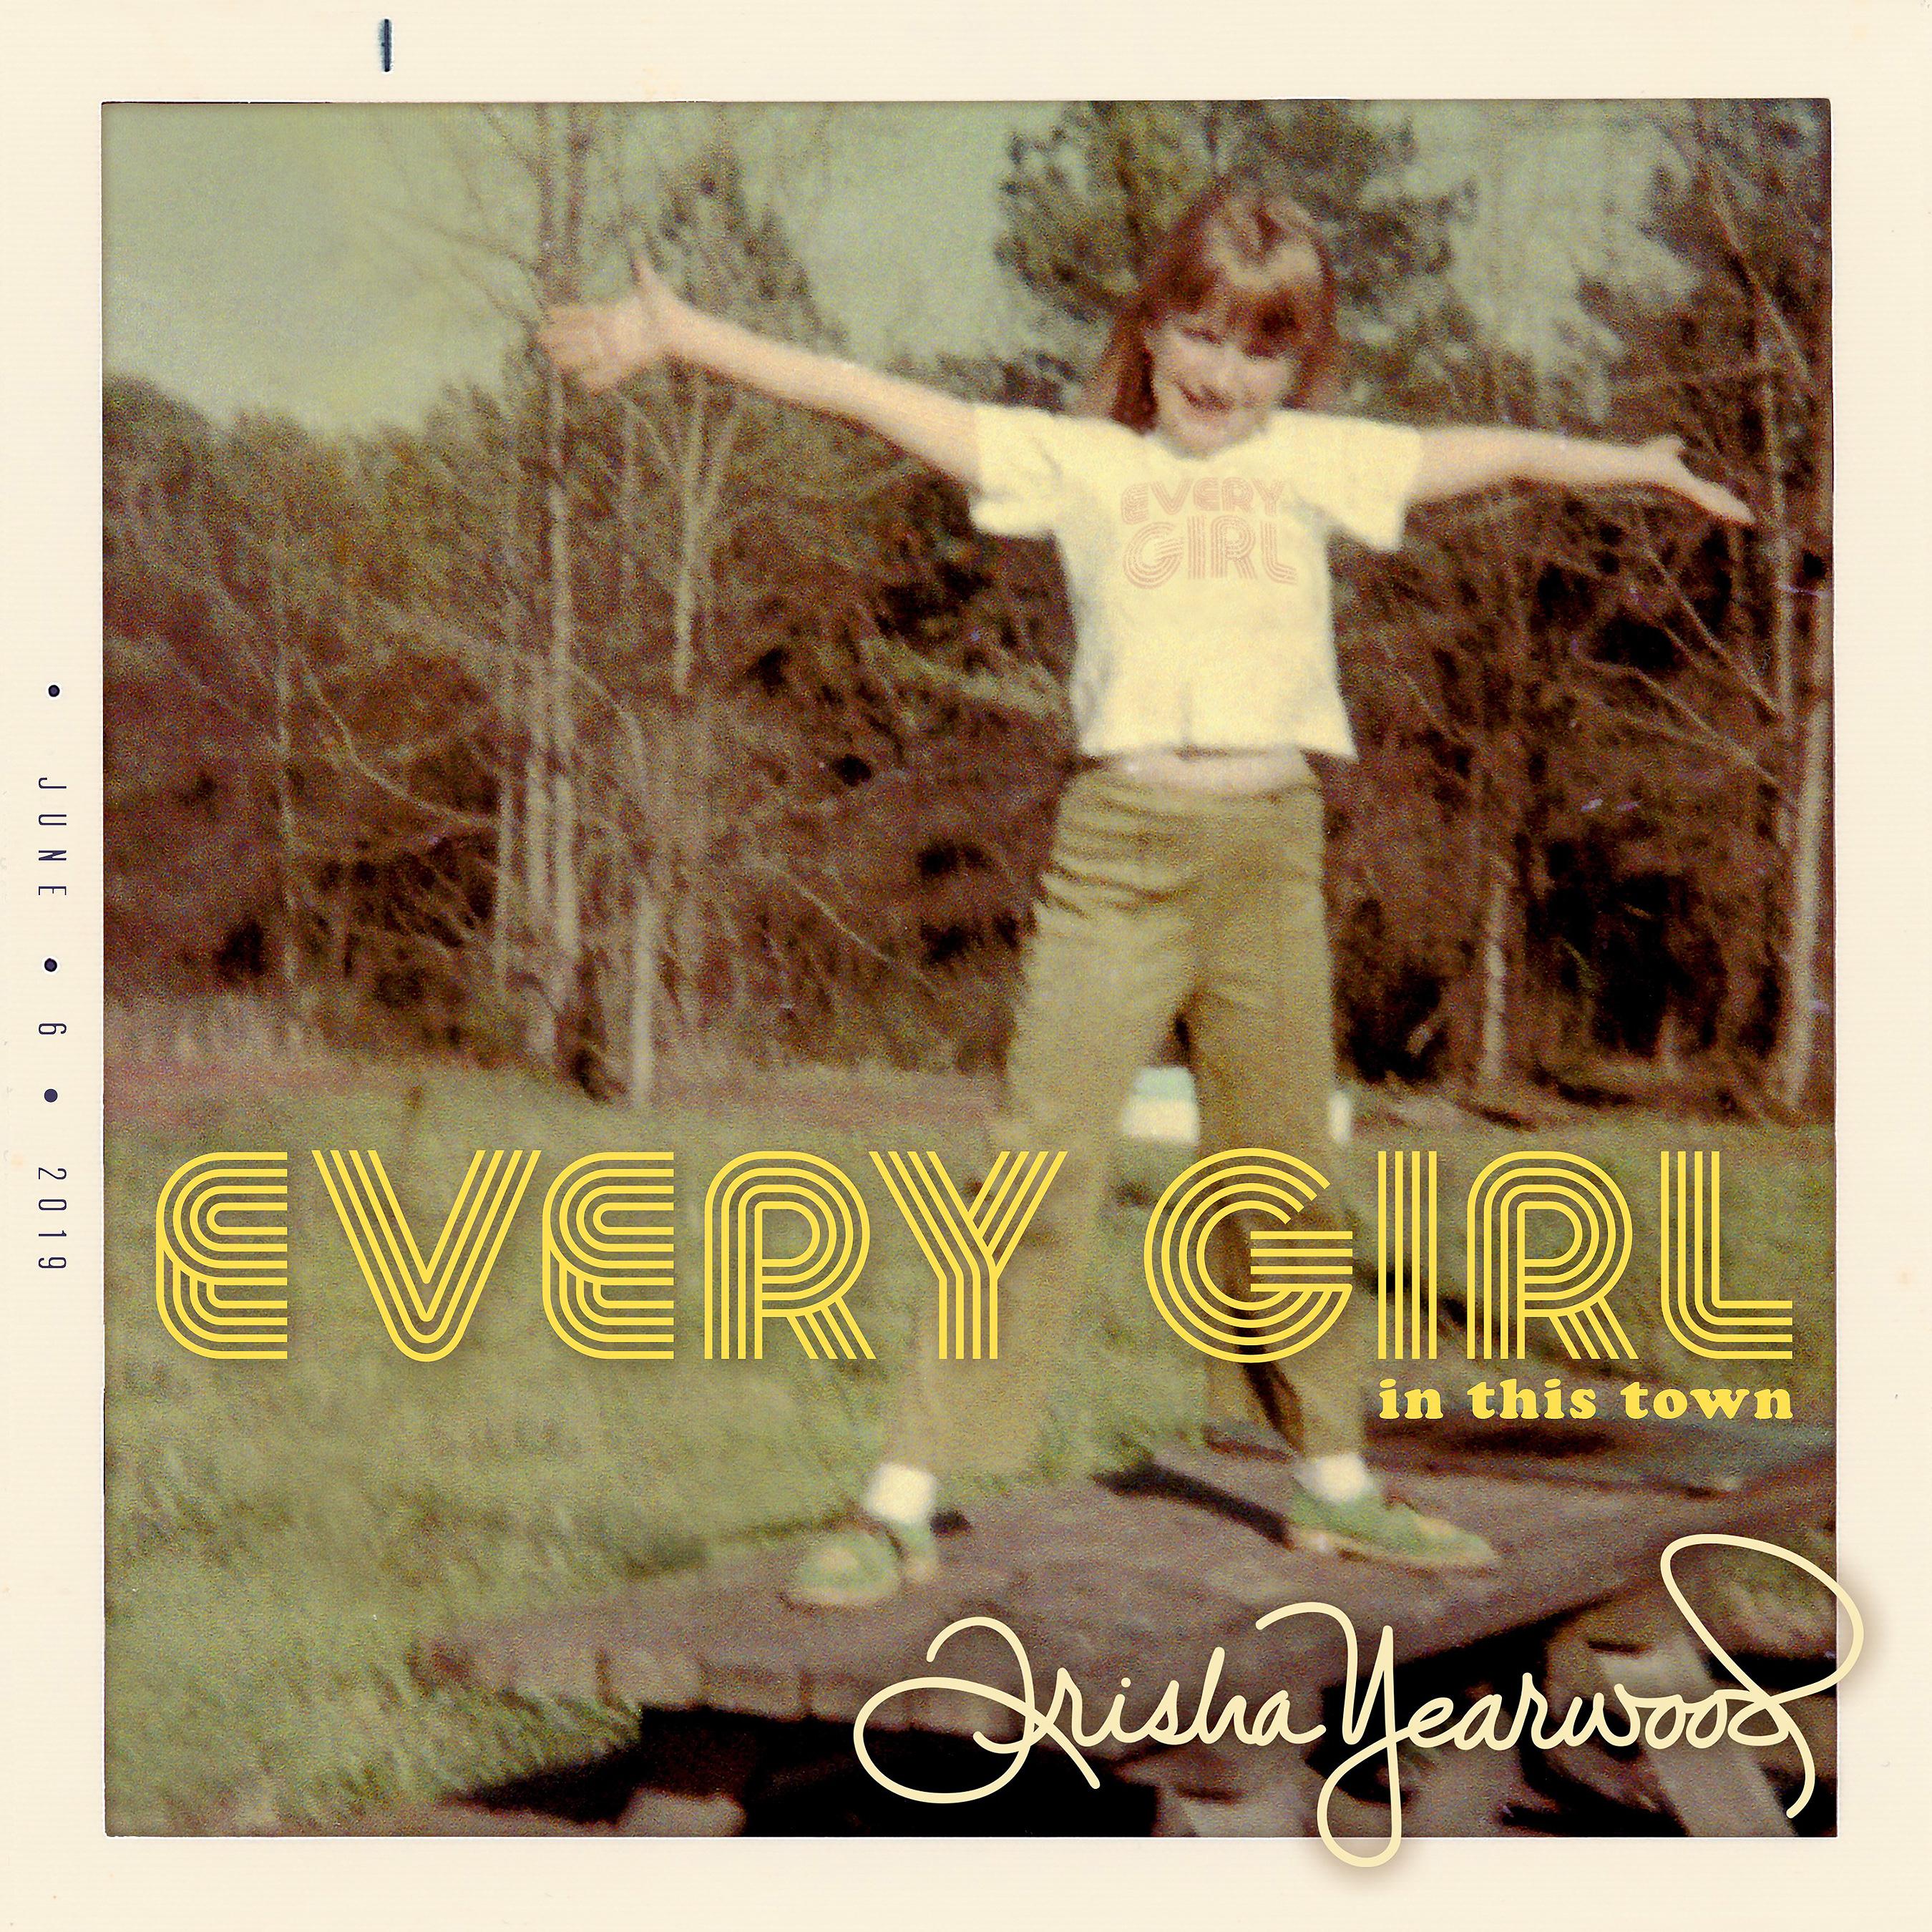 trisha yearwood  Every Girl  https://app.asana.com/0/32923395333443/1122664434739086/f  Credit: Gwendolyn Records